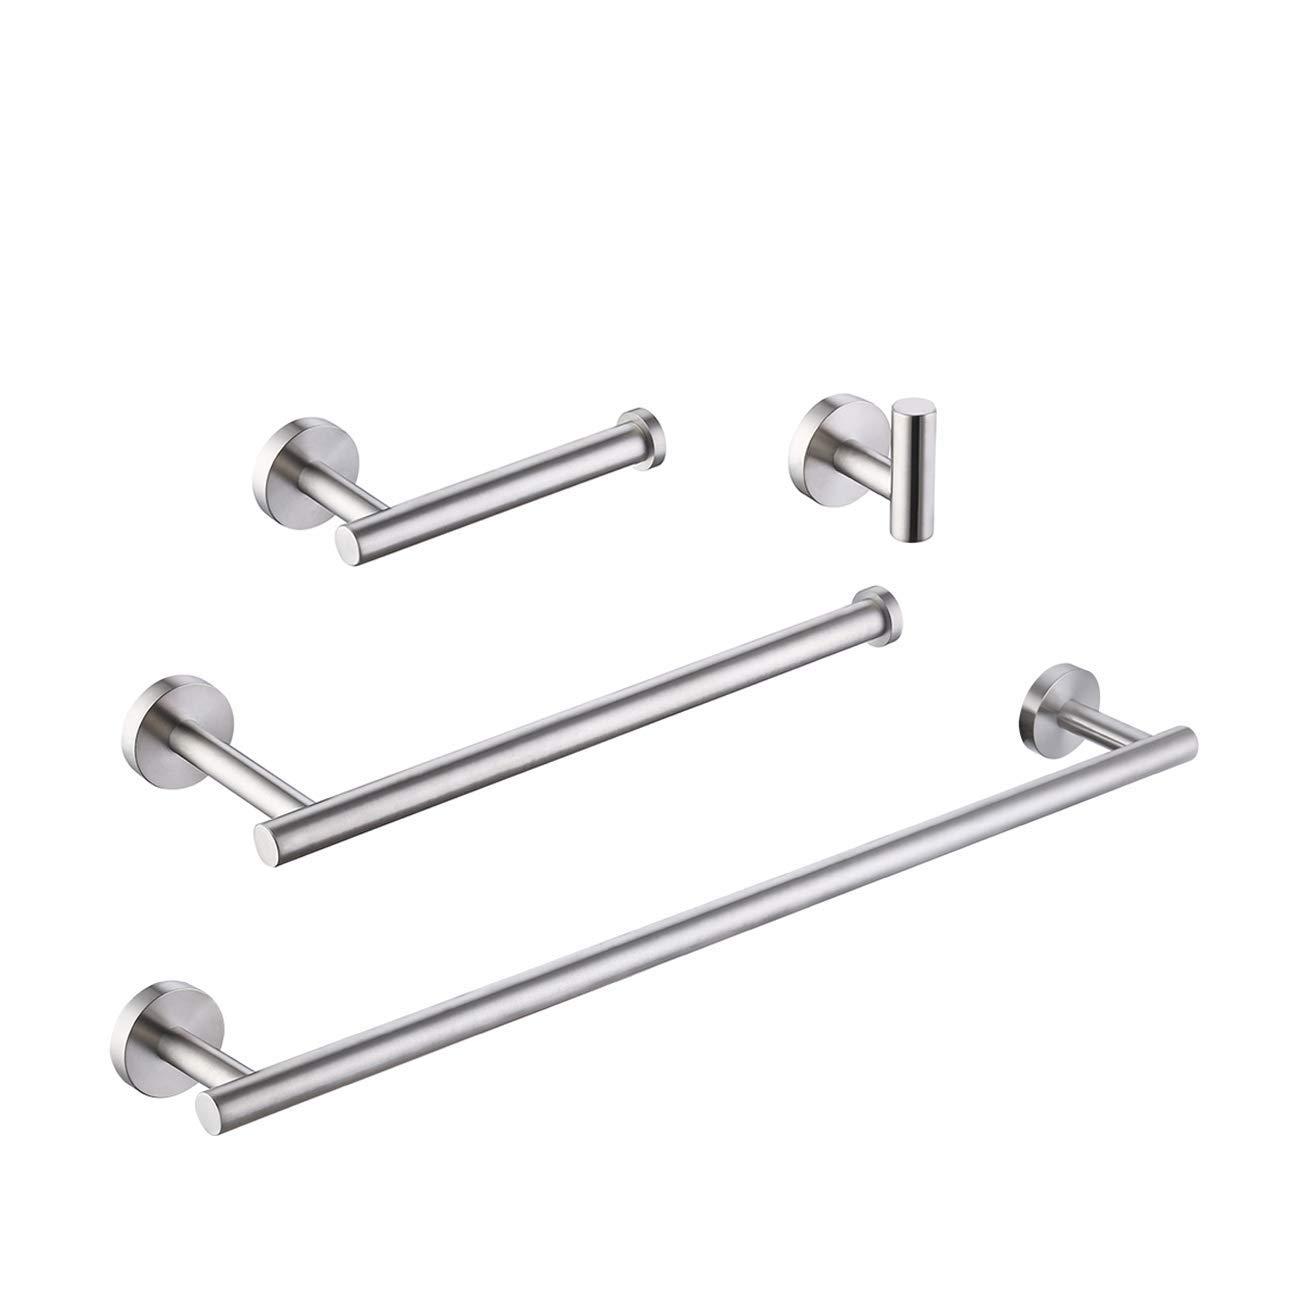 KES 4-Piece Bathroom Accessory Set Self Adhesive Towel Bar Robe Hook Toilet Paper Holder Towel Ring SUS 304 Stainless Steel RUSTPROOF No Drilling, Wall Mount Brushed Finish, LA202DG-42